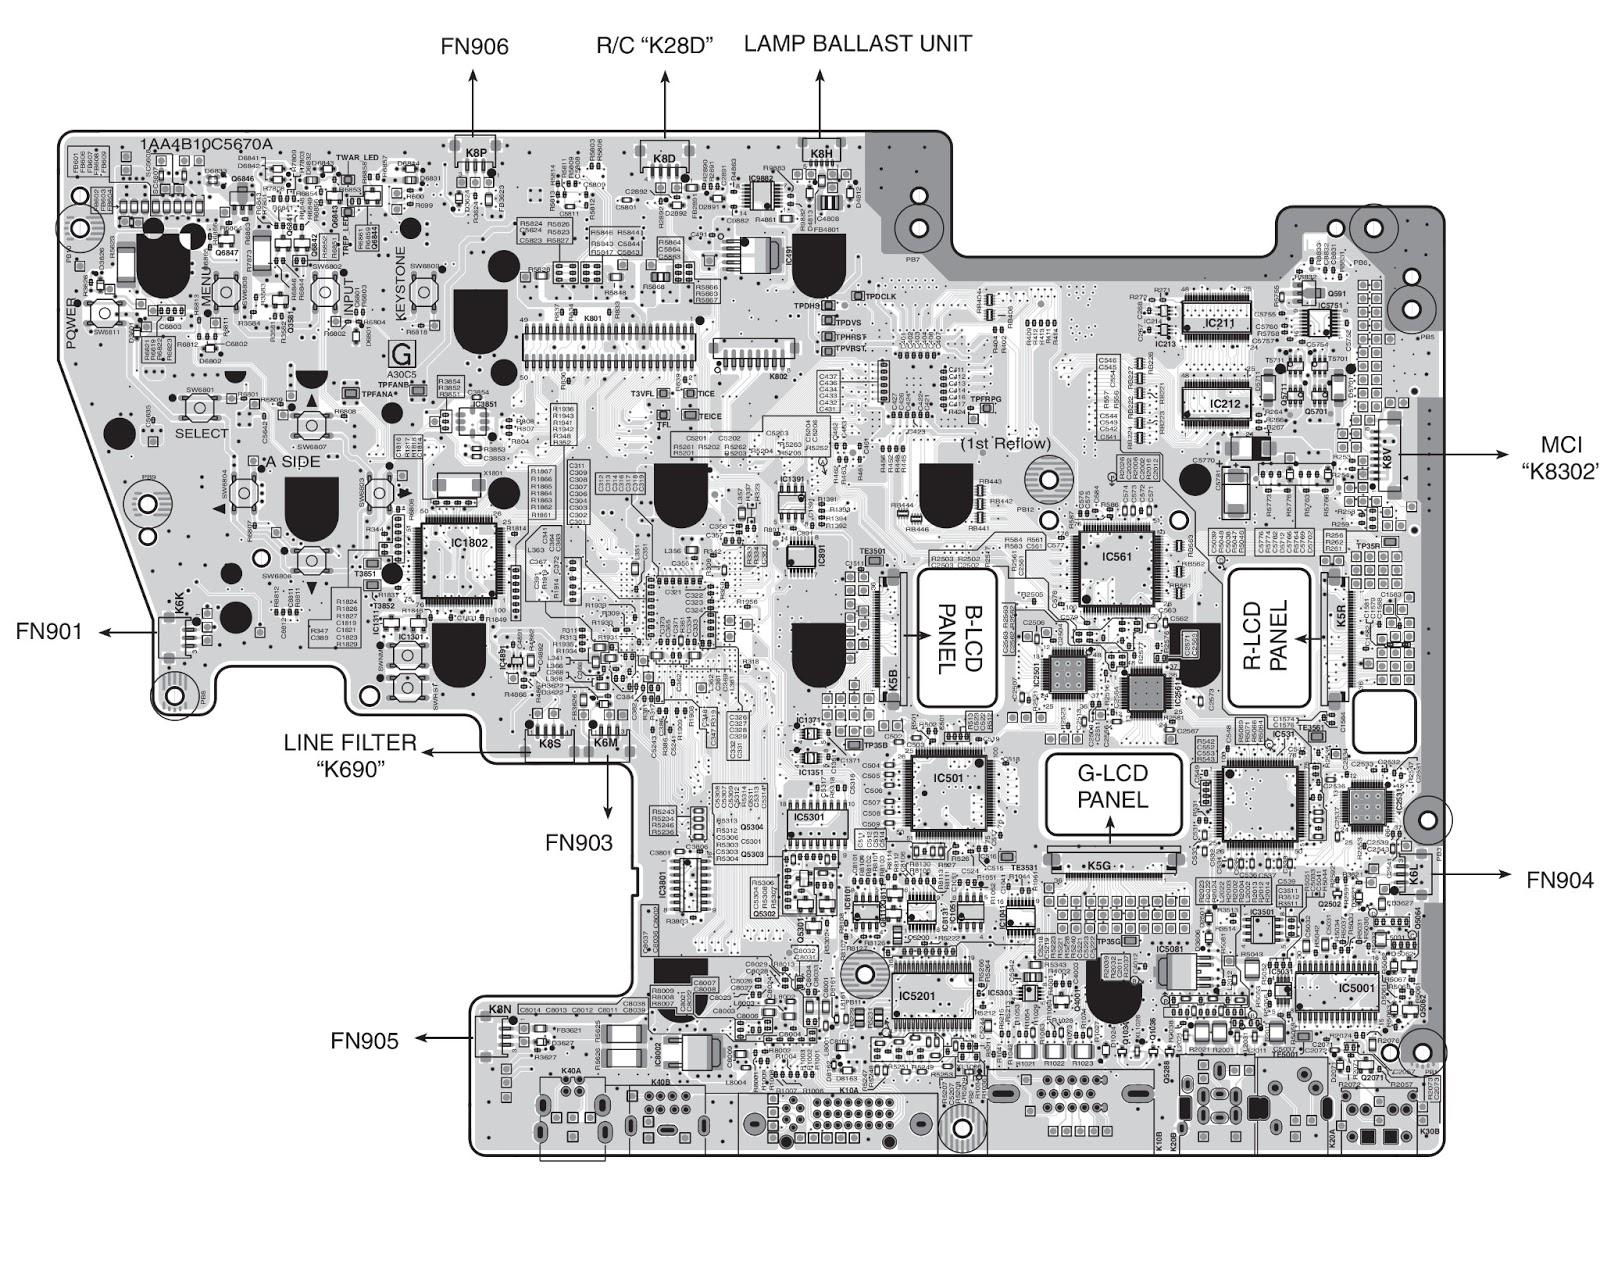 sanyo power supply wiring diagram sanyo plc xu87 projector - power supply - schematic ... k40 power supply wiring diagram